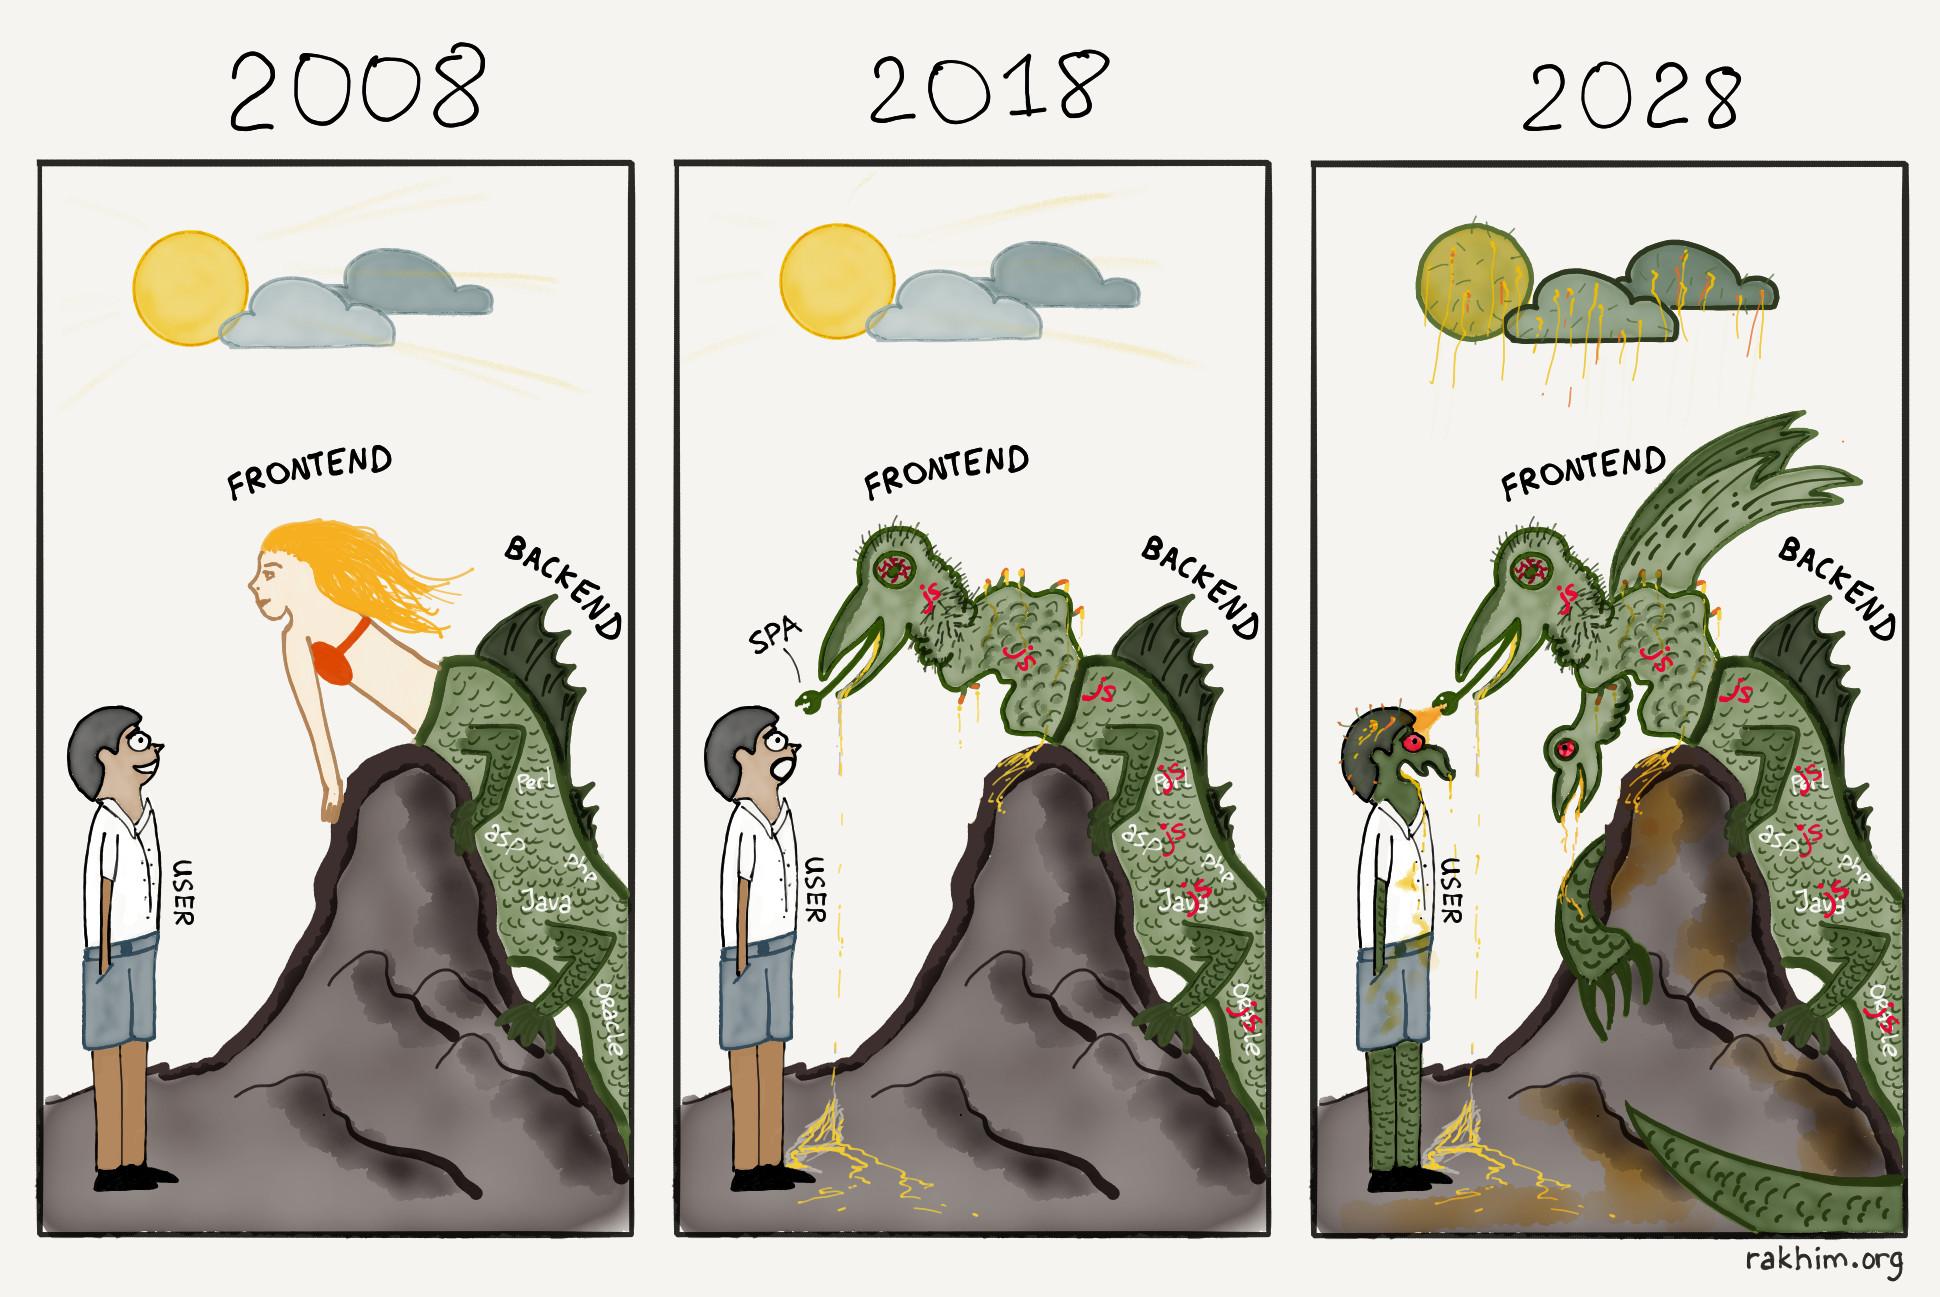 evolution of frontend vs  backend